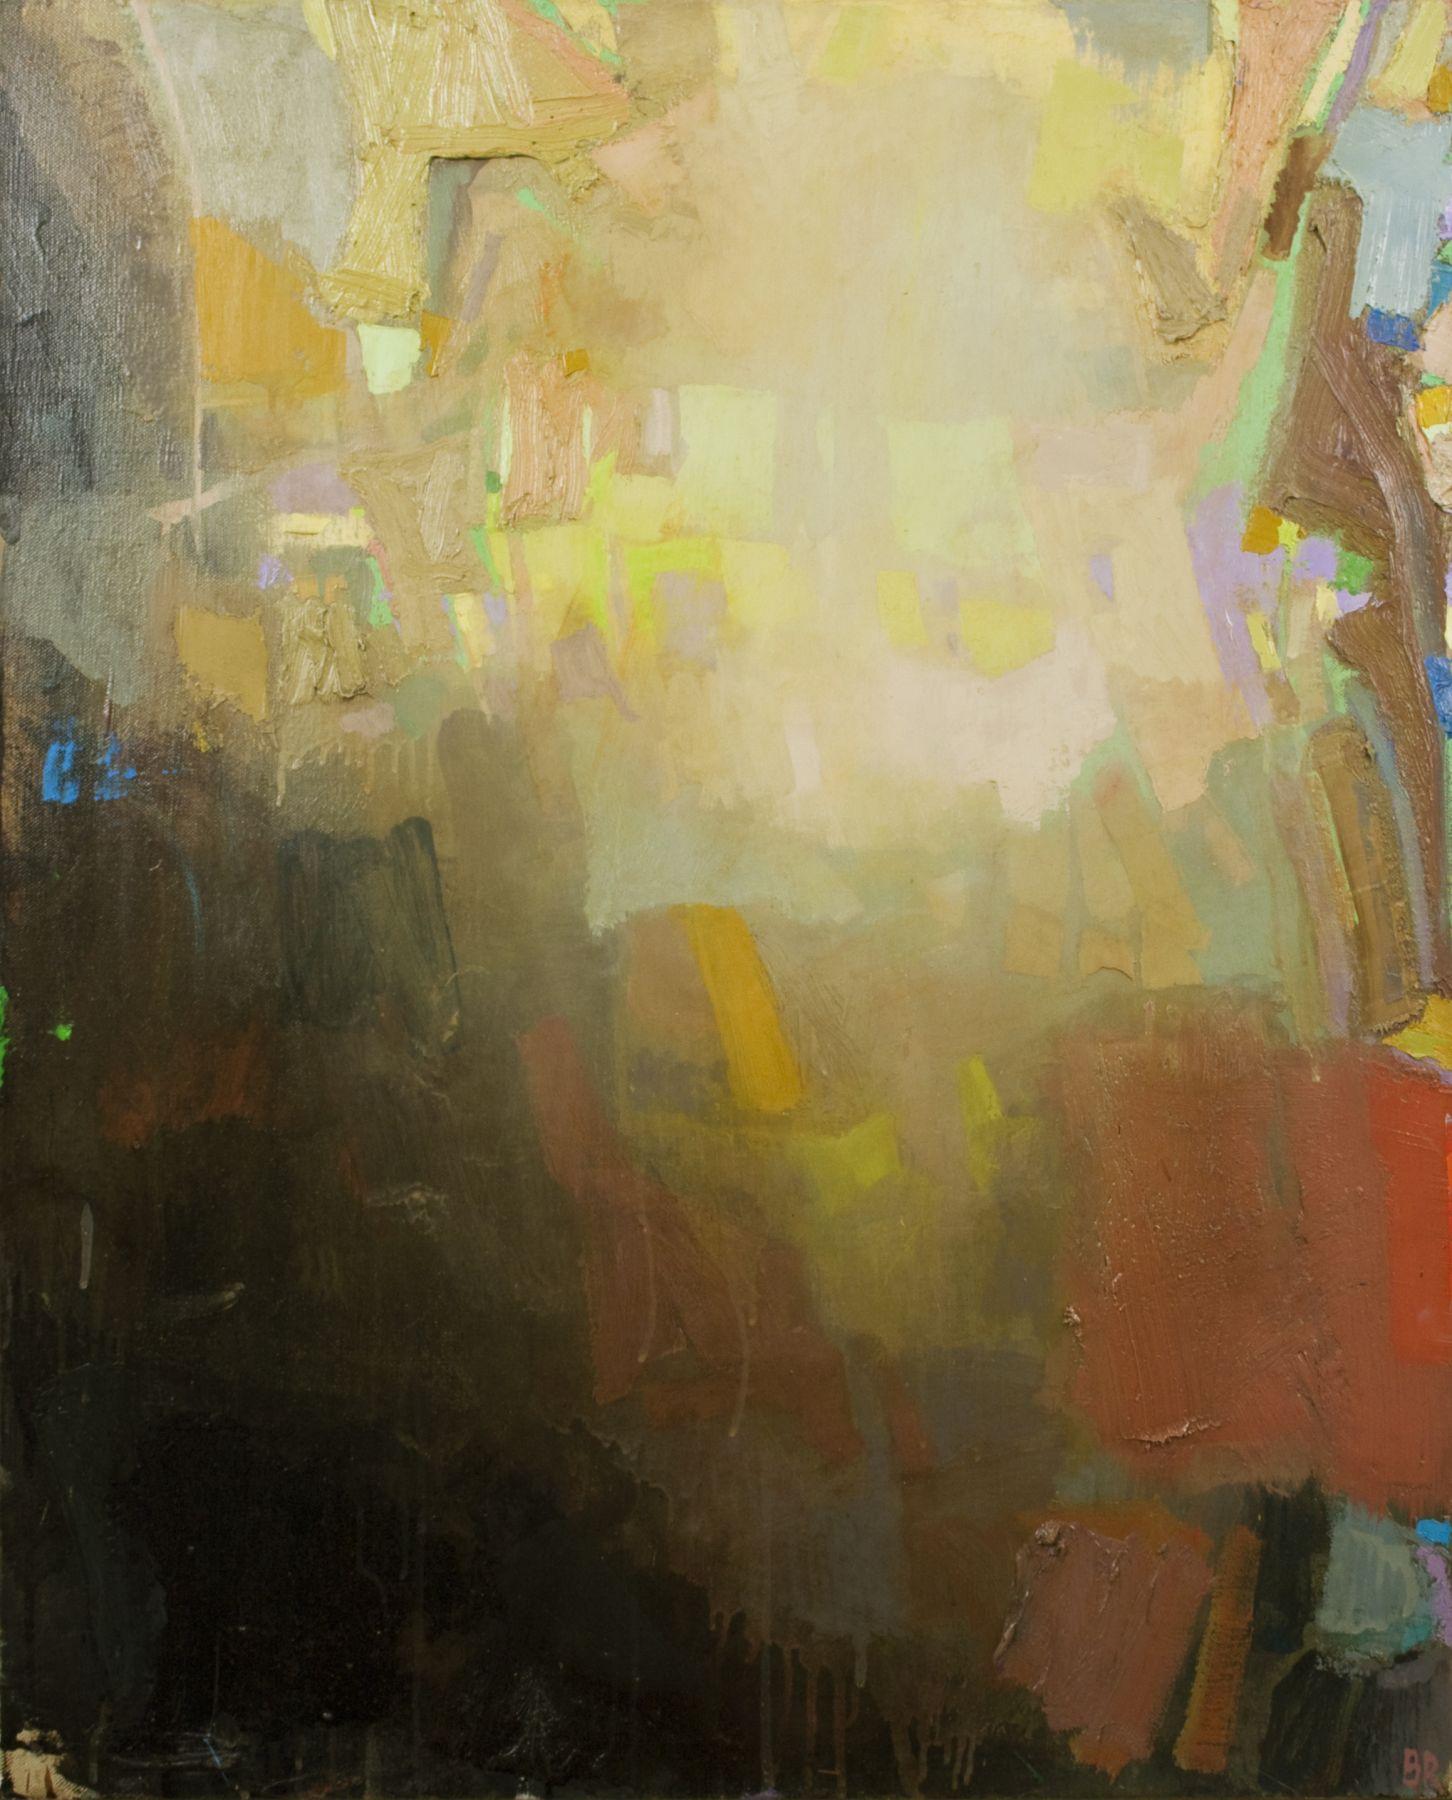 Brian Rutenberg Gainsborough Suite 2, 2010, oil on linen, 32 x 26 inches